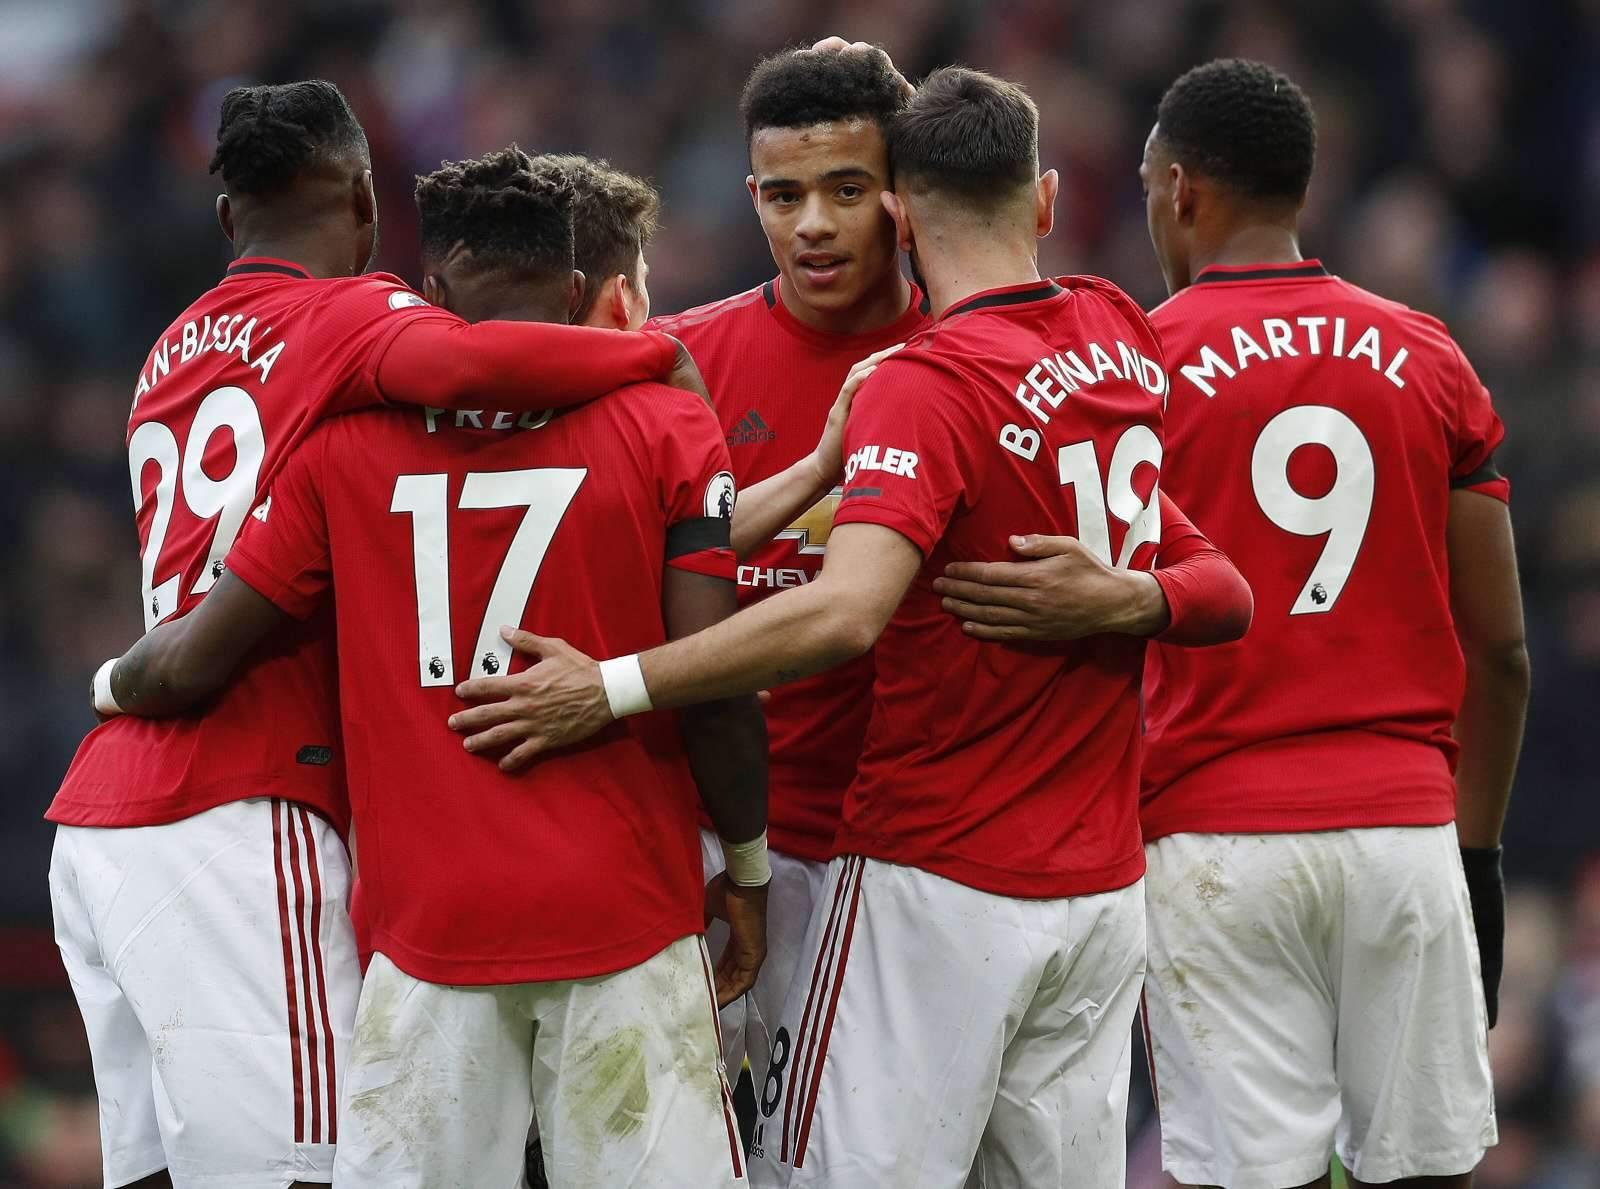 «Манчестер Юнайтед» - «Вест Бромвич» - 1:0 (завершён)